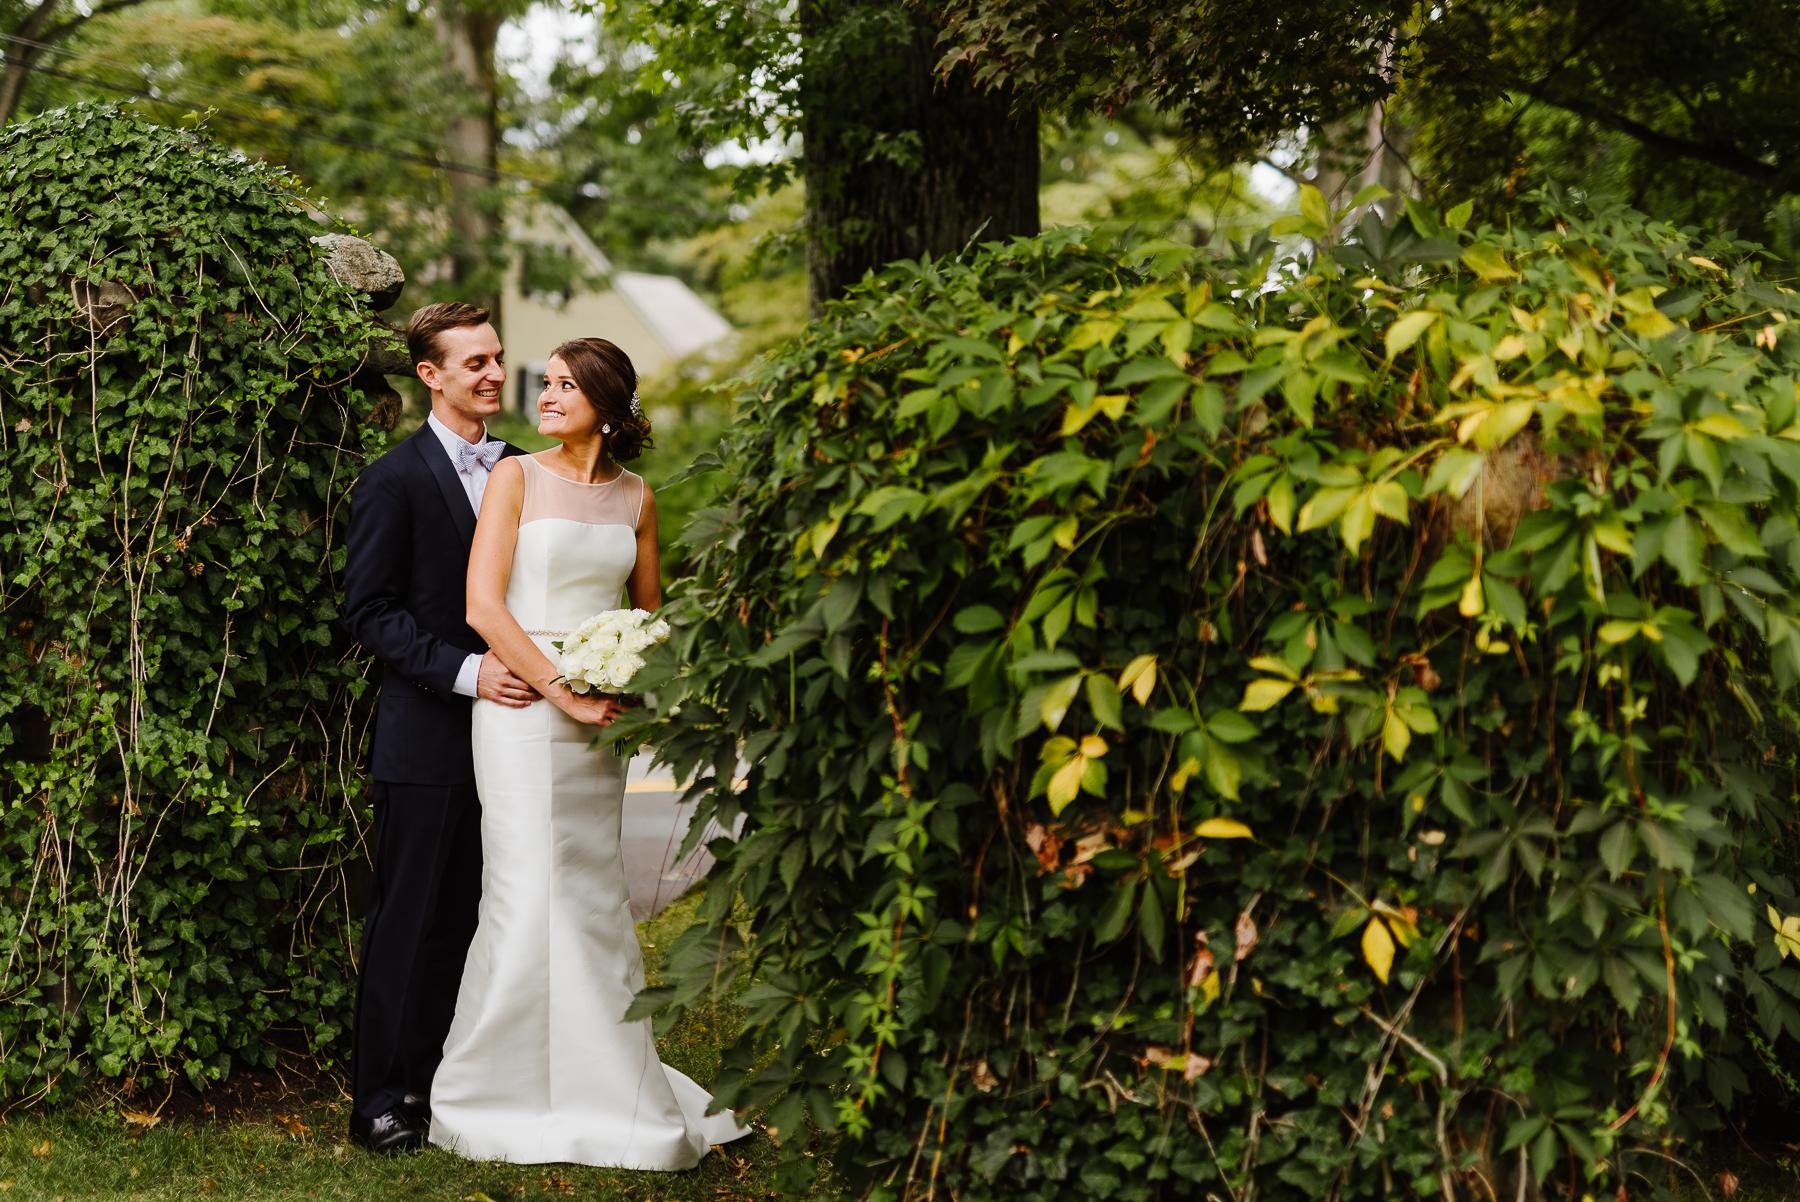 84-J Crew Wedding New Jersey Wedding Photographer J Crew Weddings.jpg